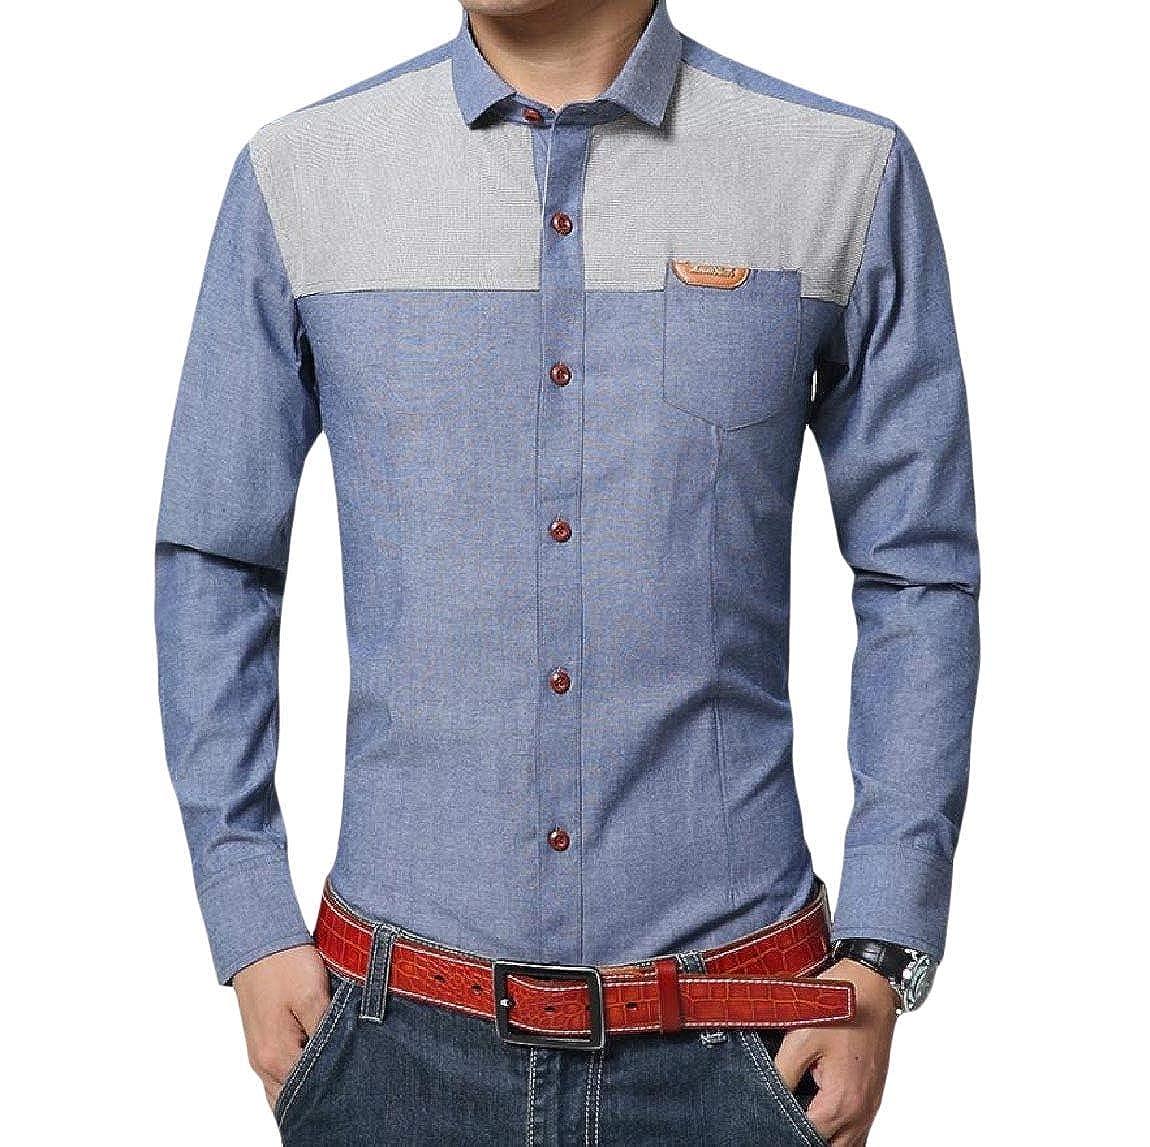 Zimaes-Men Spread Collar Non-Iron Formal Cotton Linen Dress Shirts